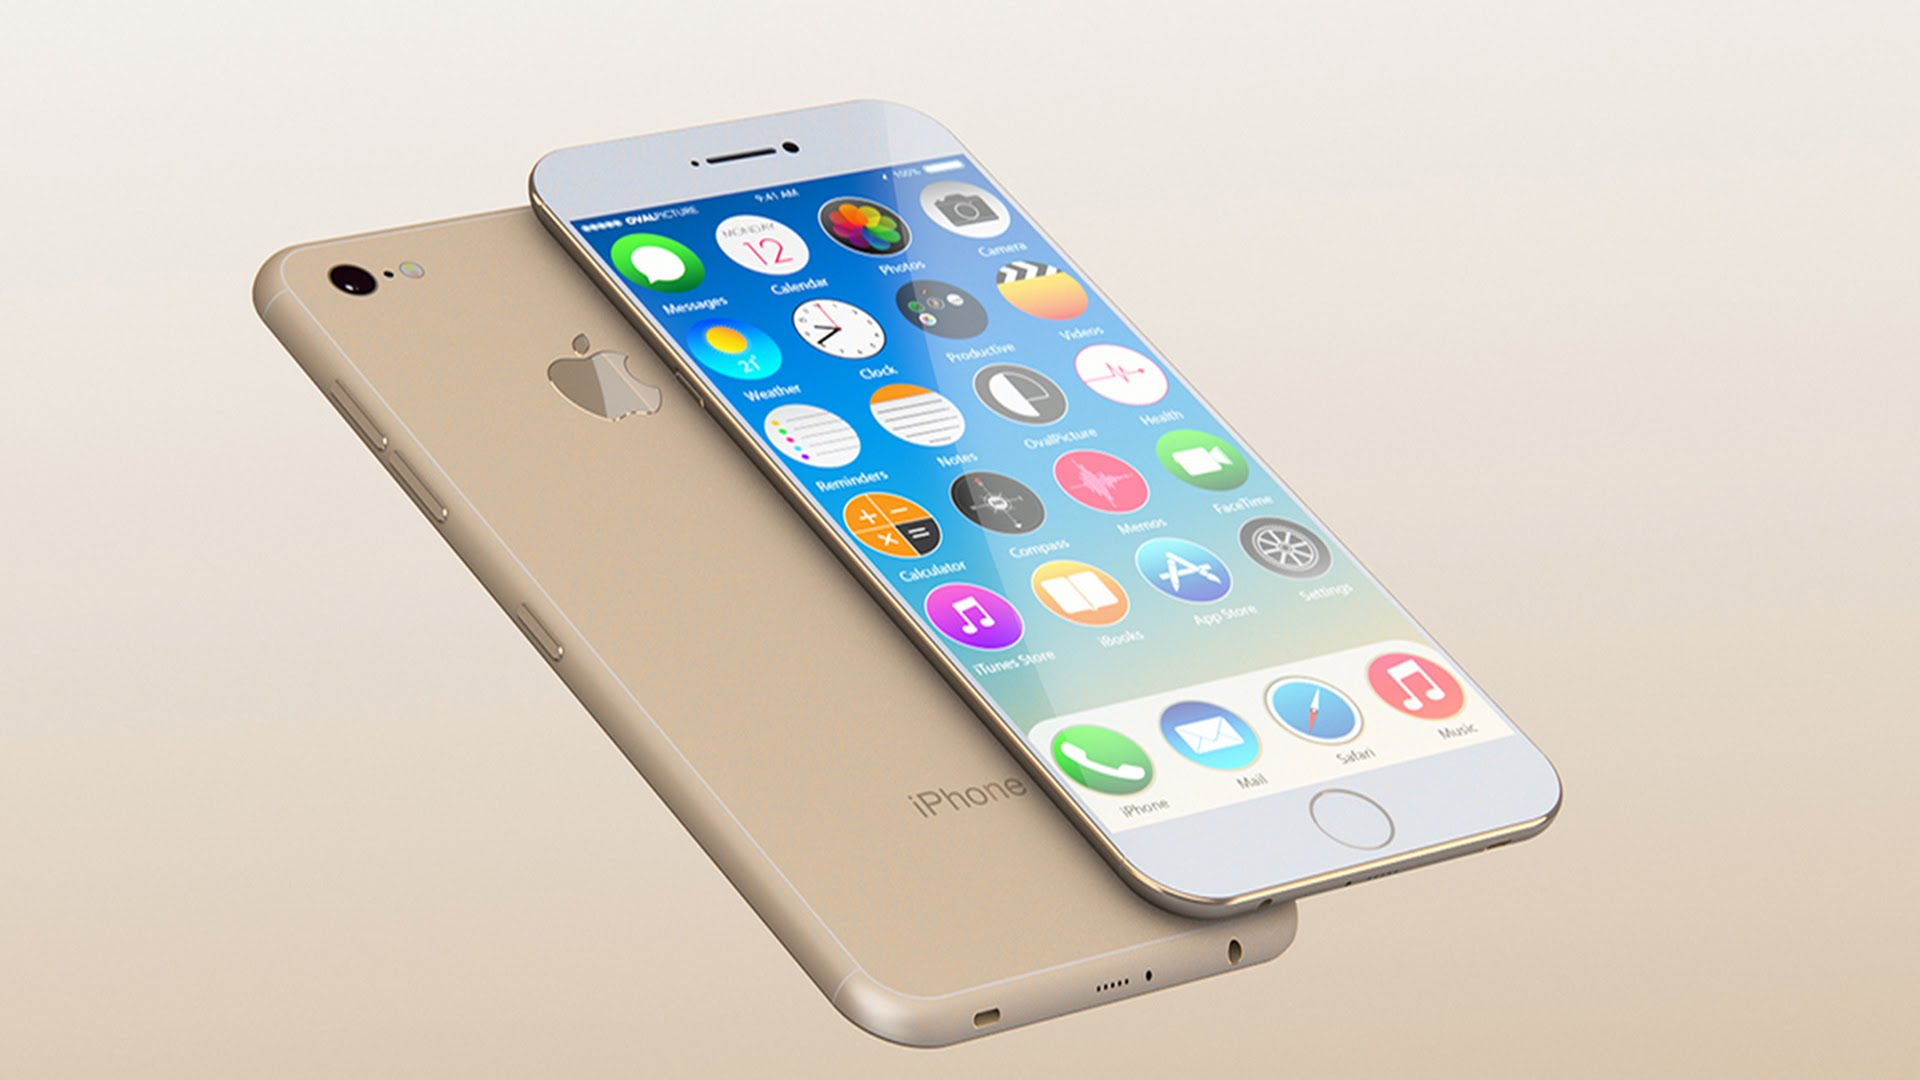 apple-iphone-7-iphone-7-plus-pc-tablet-media